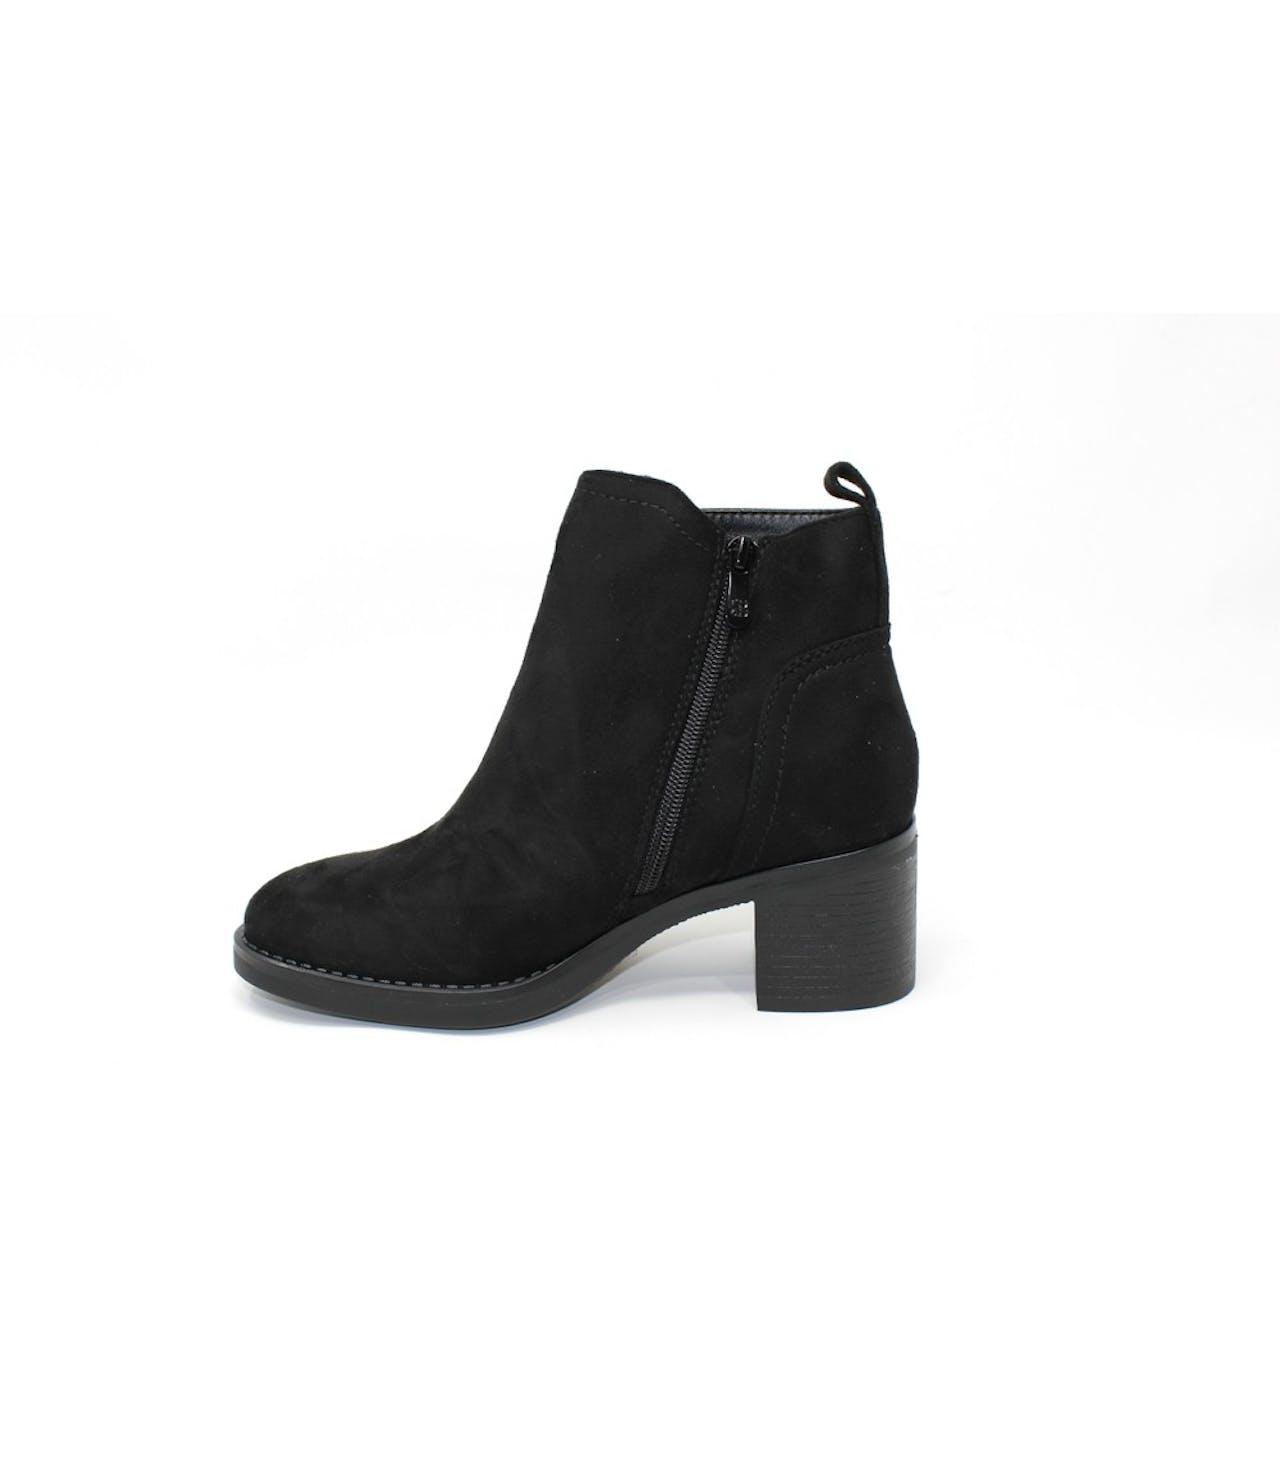 Shoe Lounge Black Block-Heel Ankle Boot